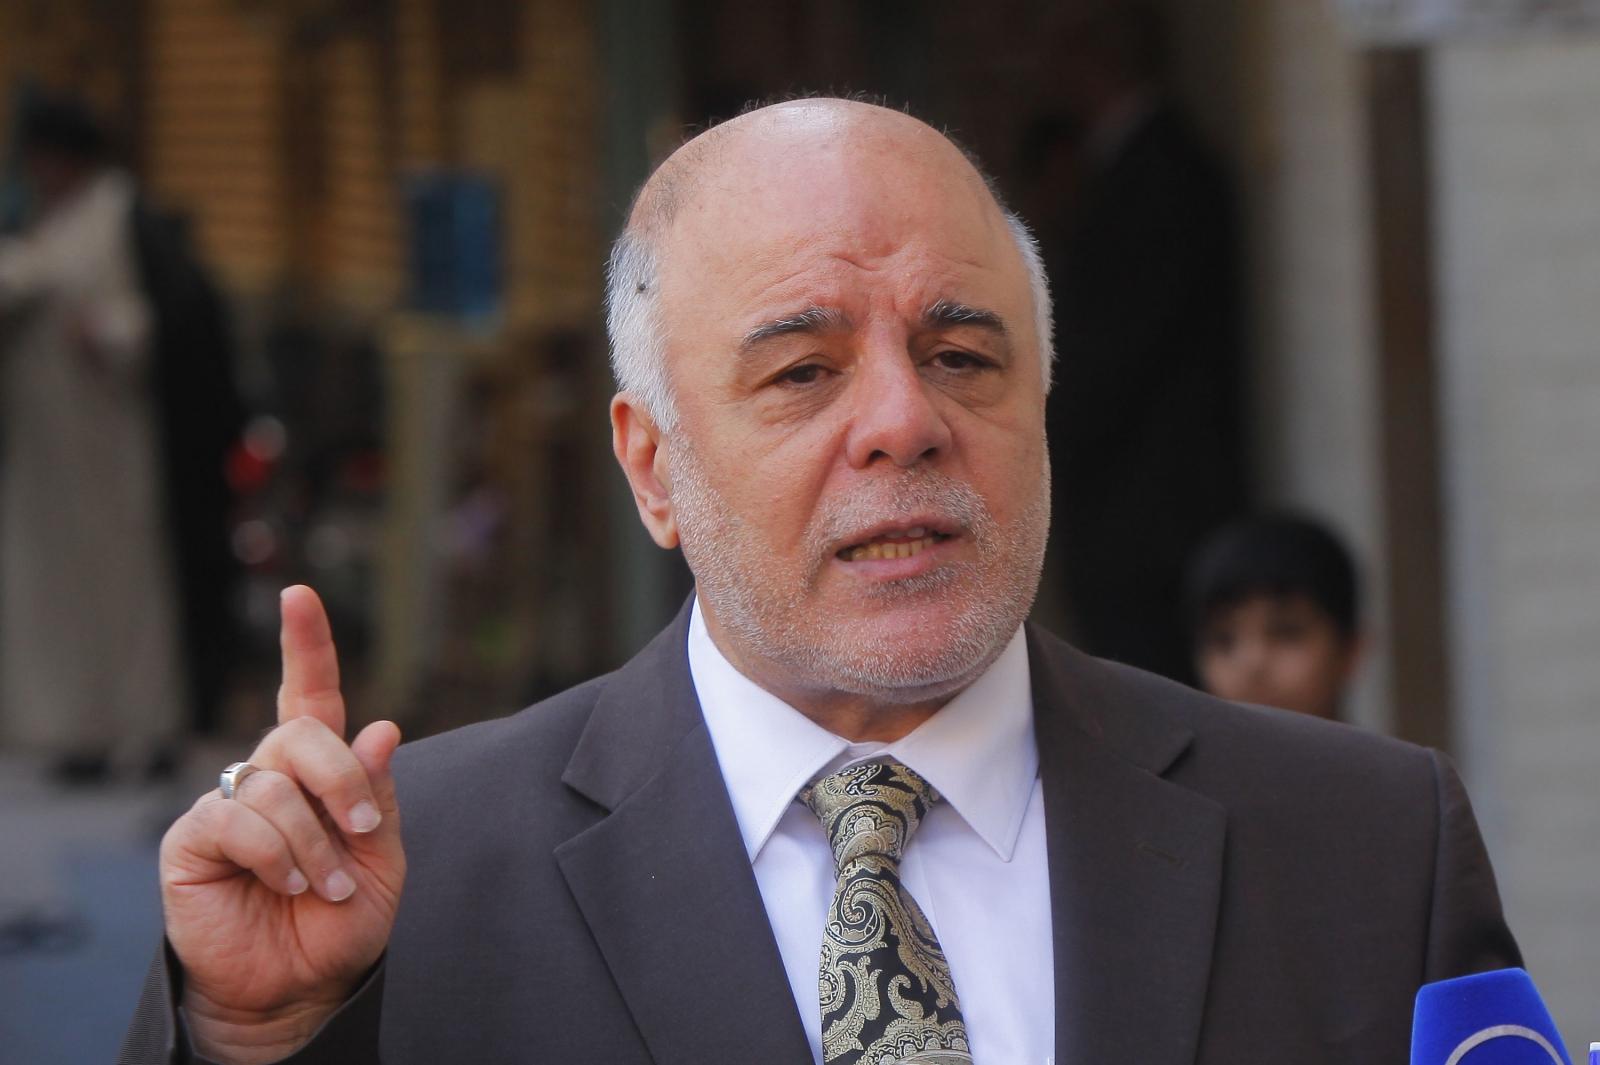 Iraqi PM Haider al-Abadi in Iran for Isis talks